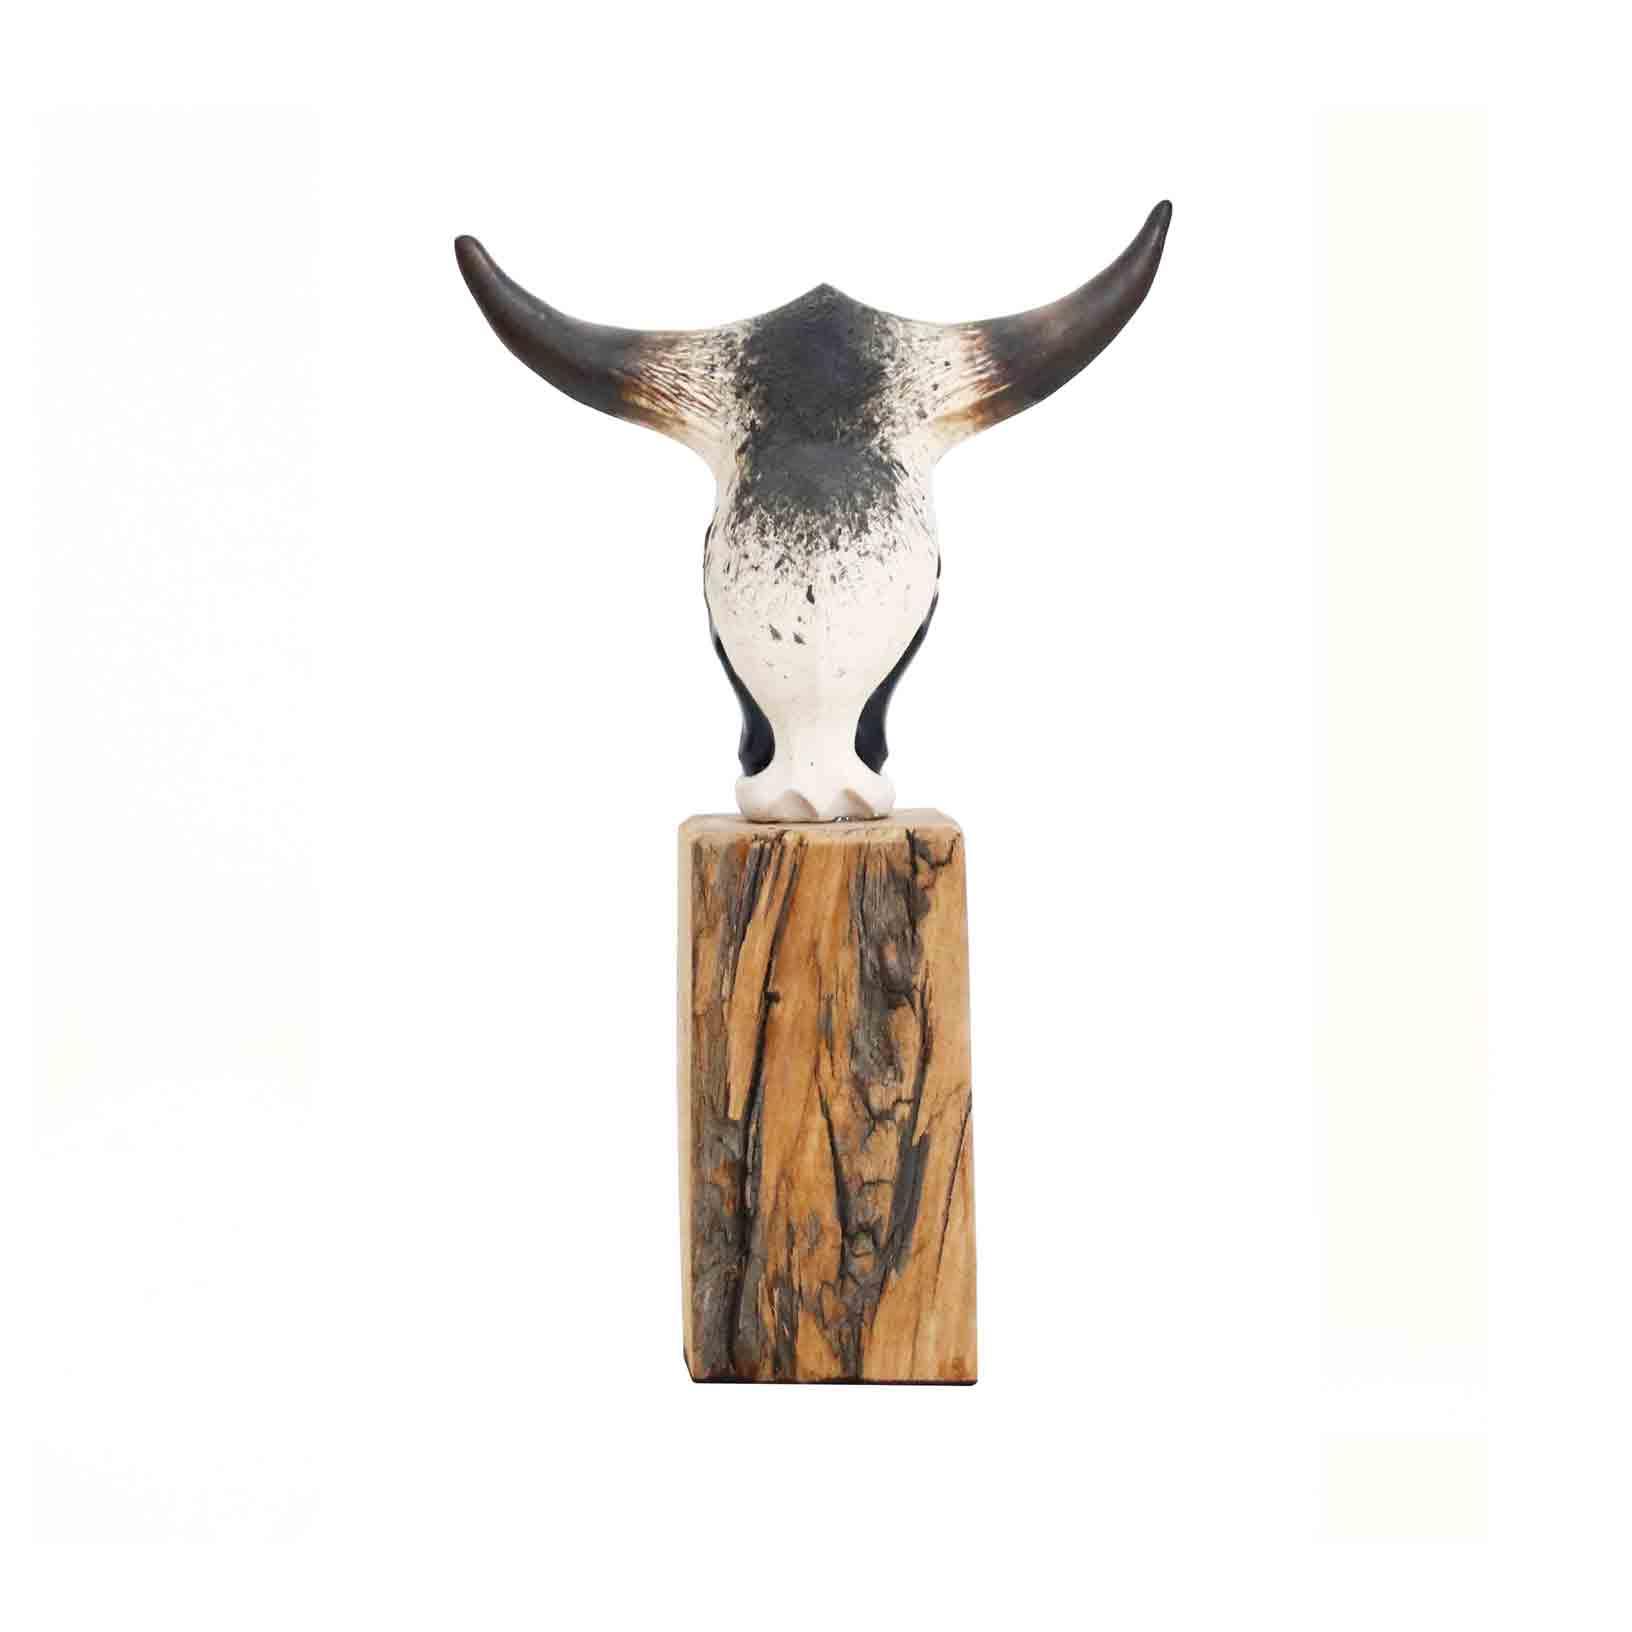 Fani madoda | Eclectica contemporary | Art Gallery | Cape Town |